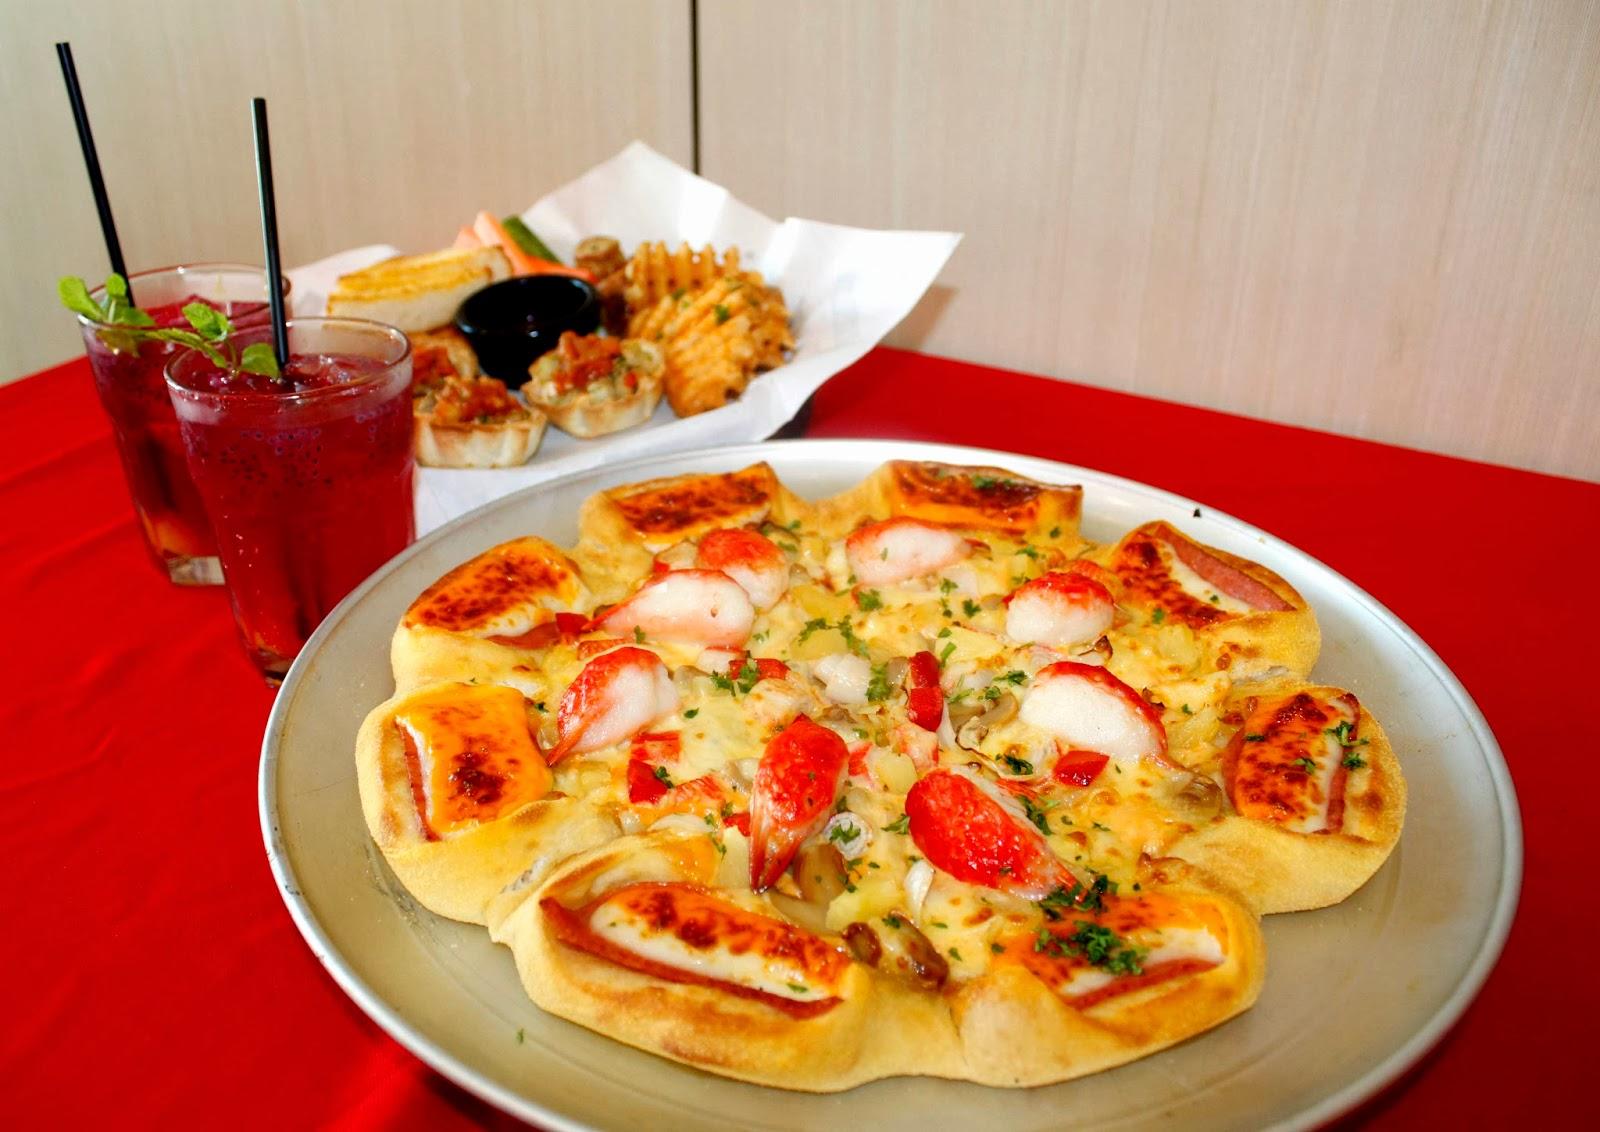 pizza hut large pizza price malaysia